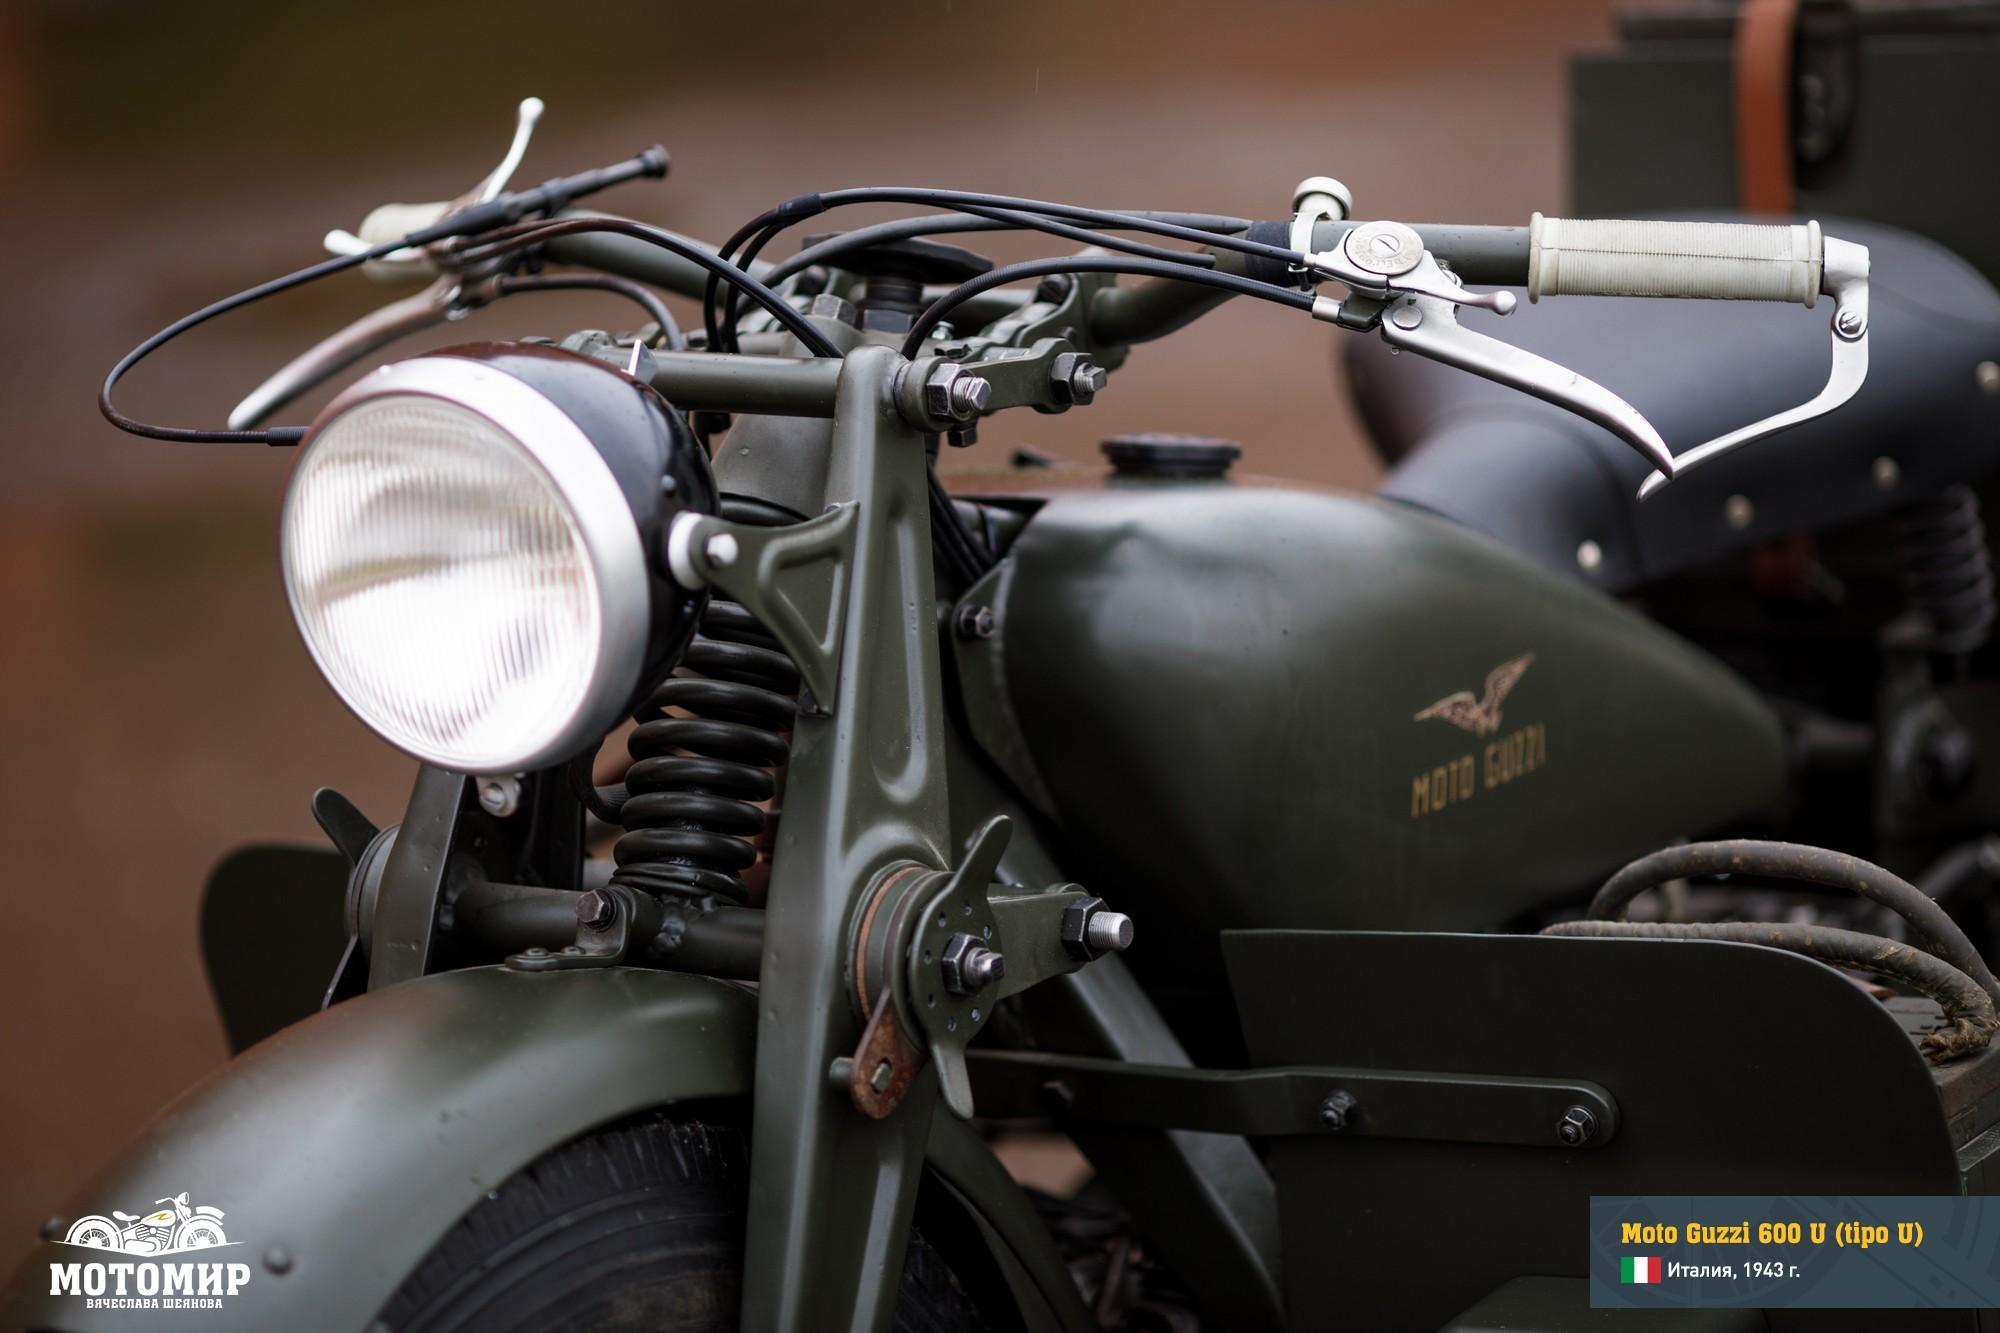 moto-guzzi-600-u-web-13